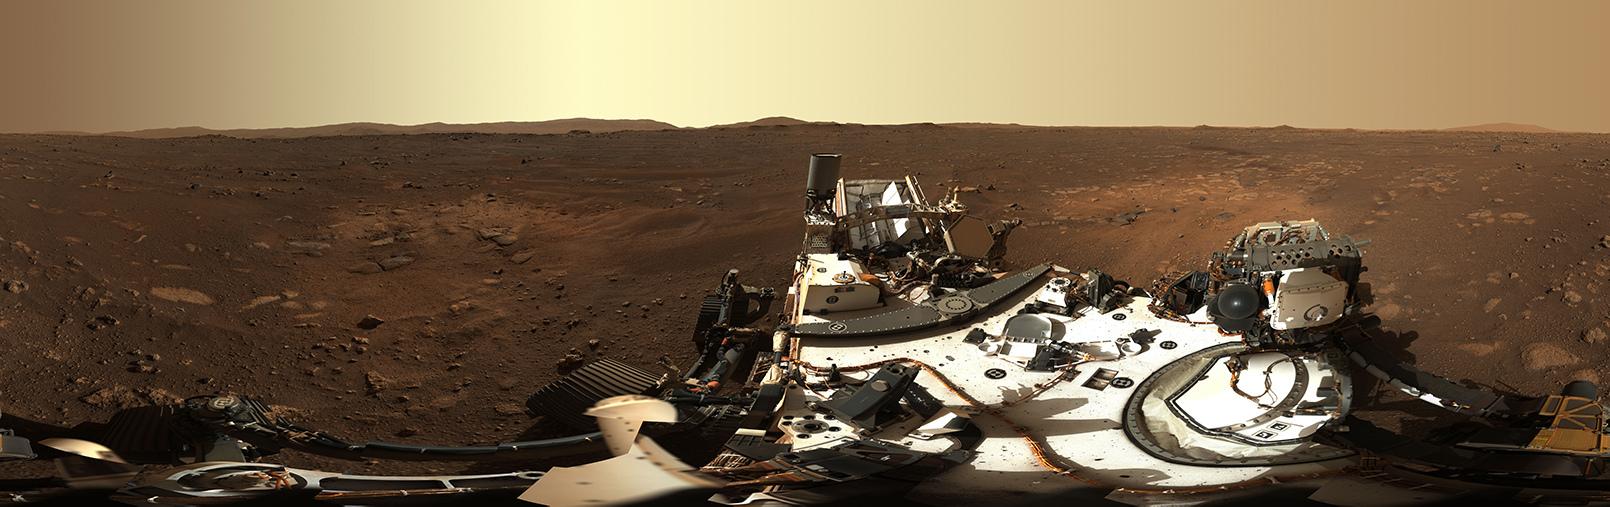 panoSol3MastCam-NASA.jpg